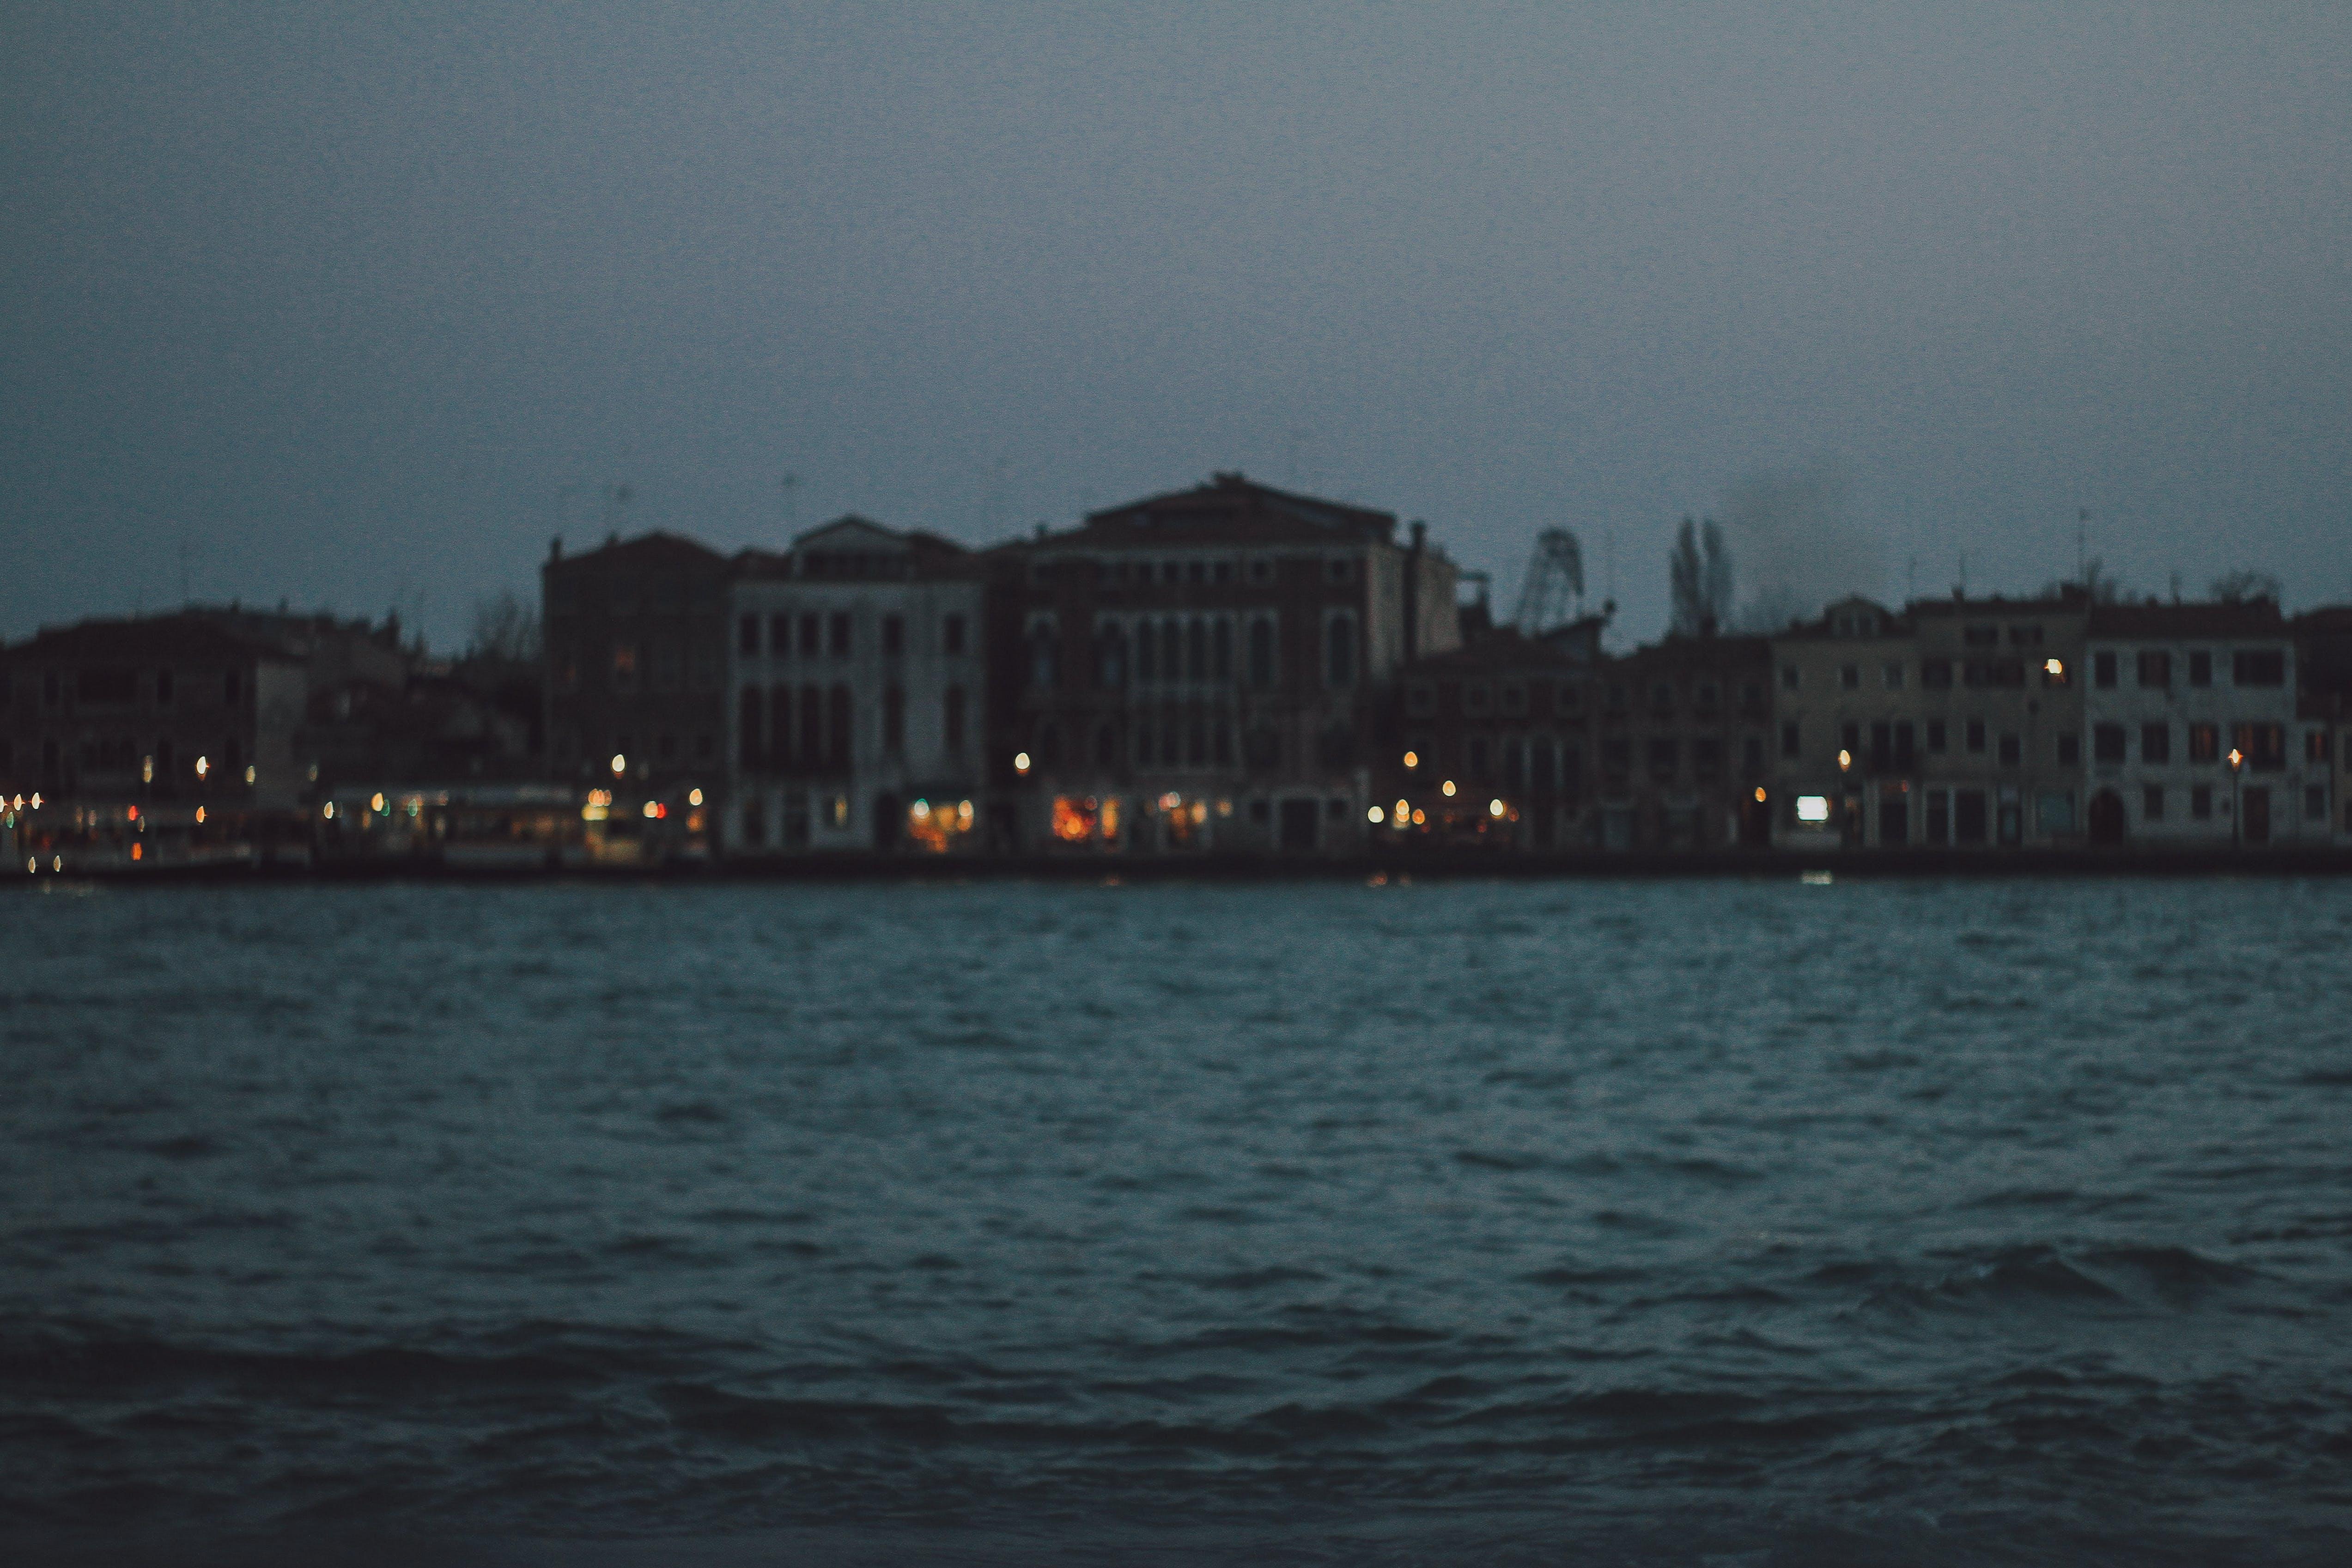 Kostenloses Stock Foto zu beleuchtung, italien, kein fokus, venedig